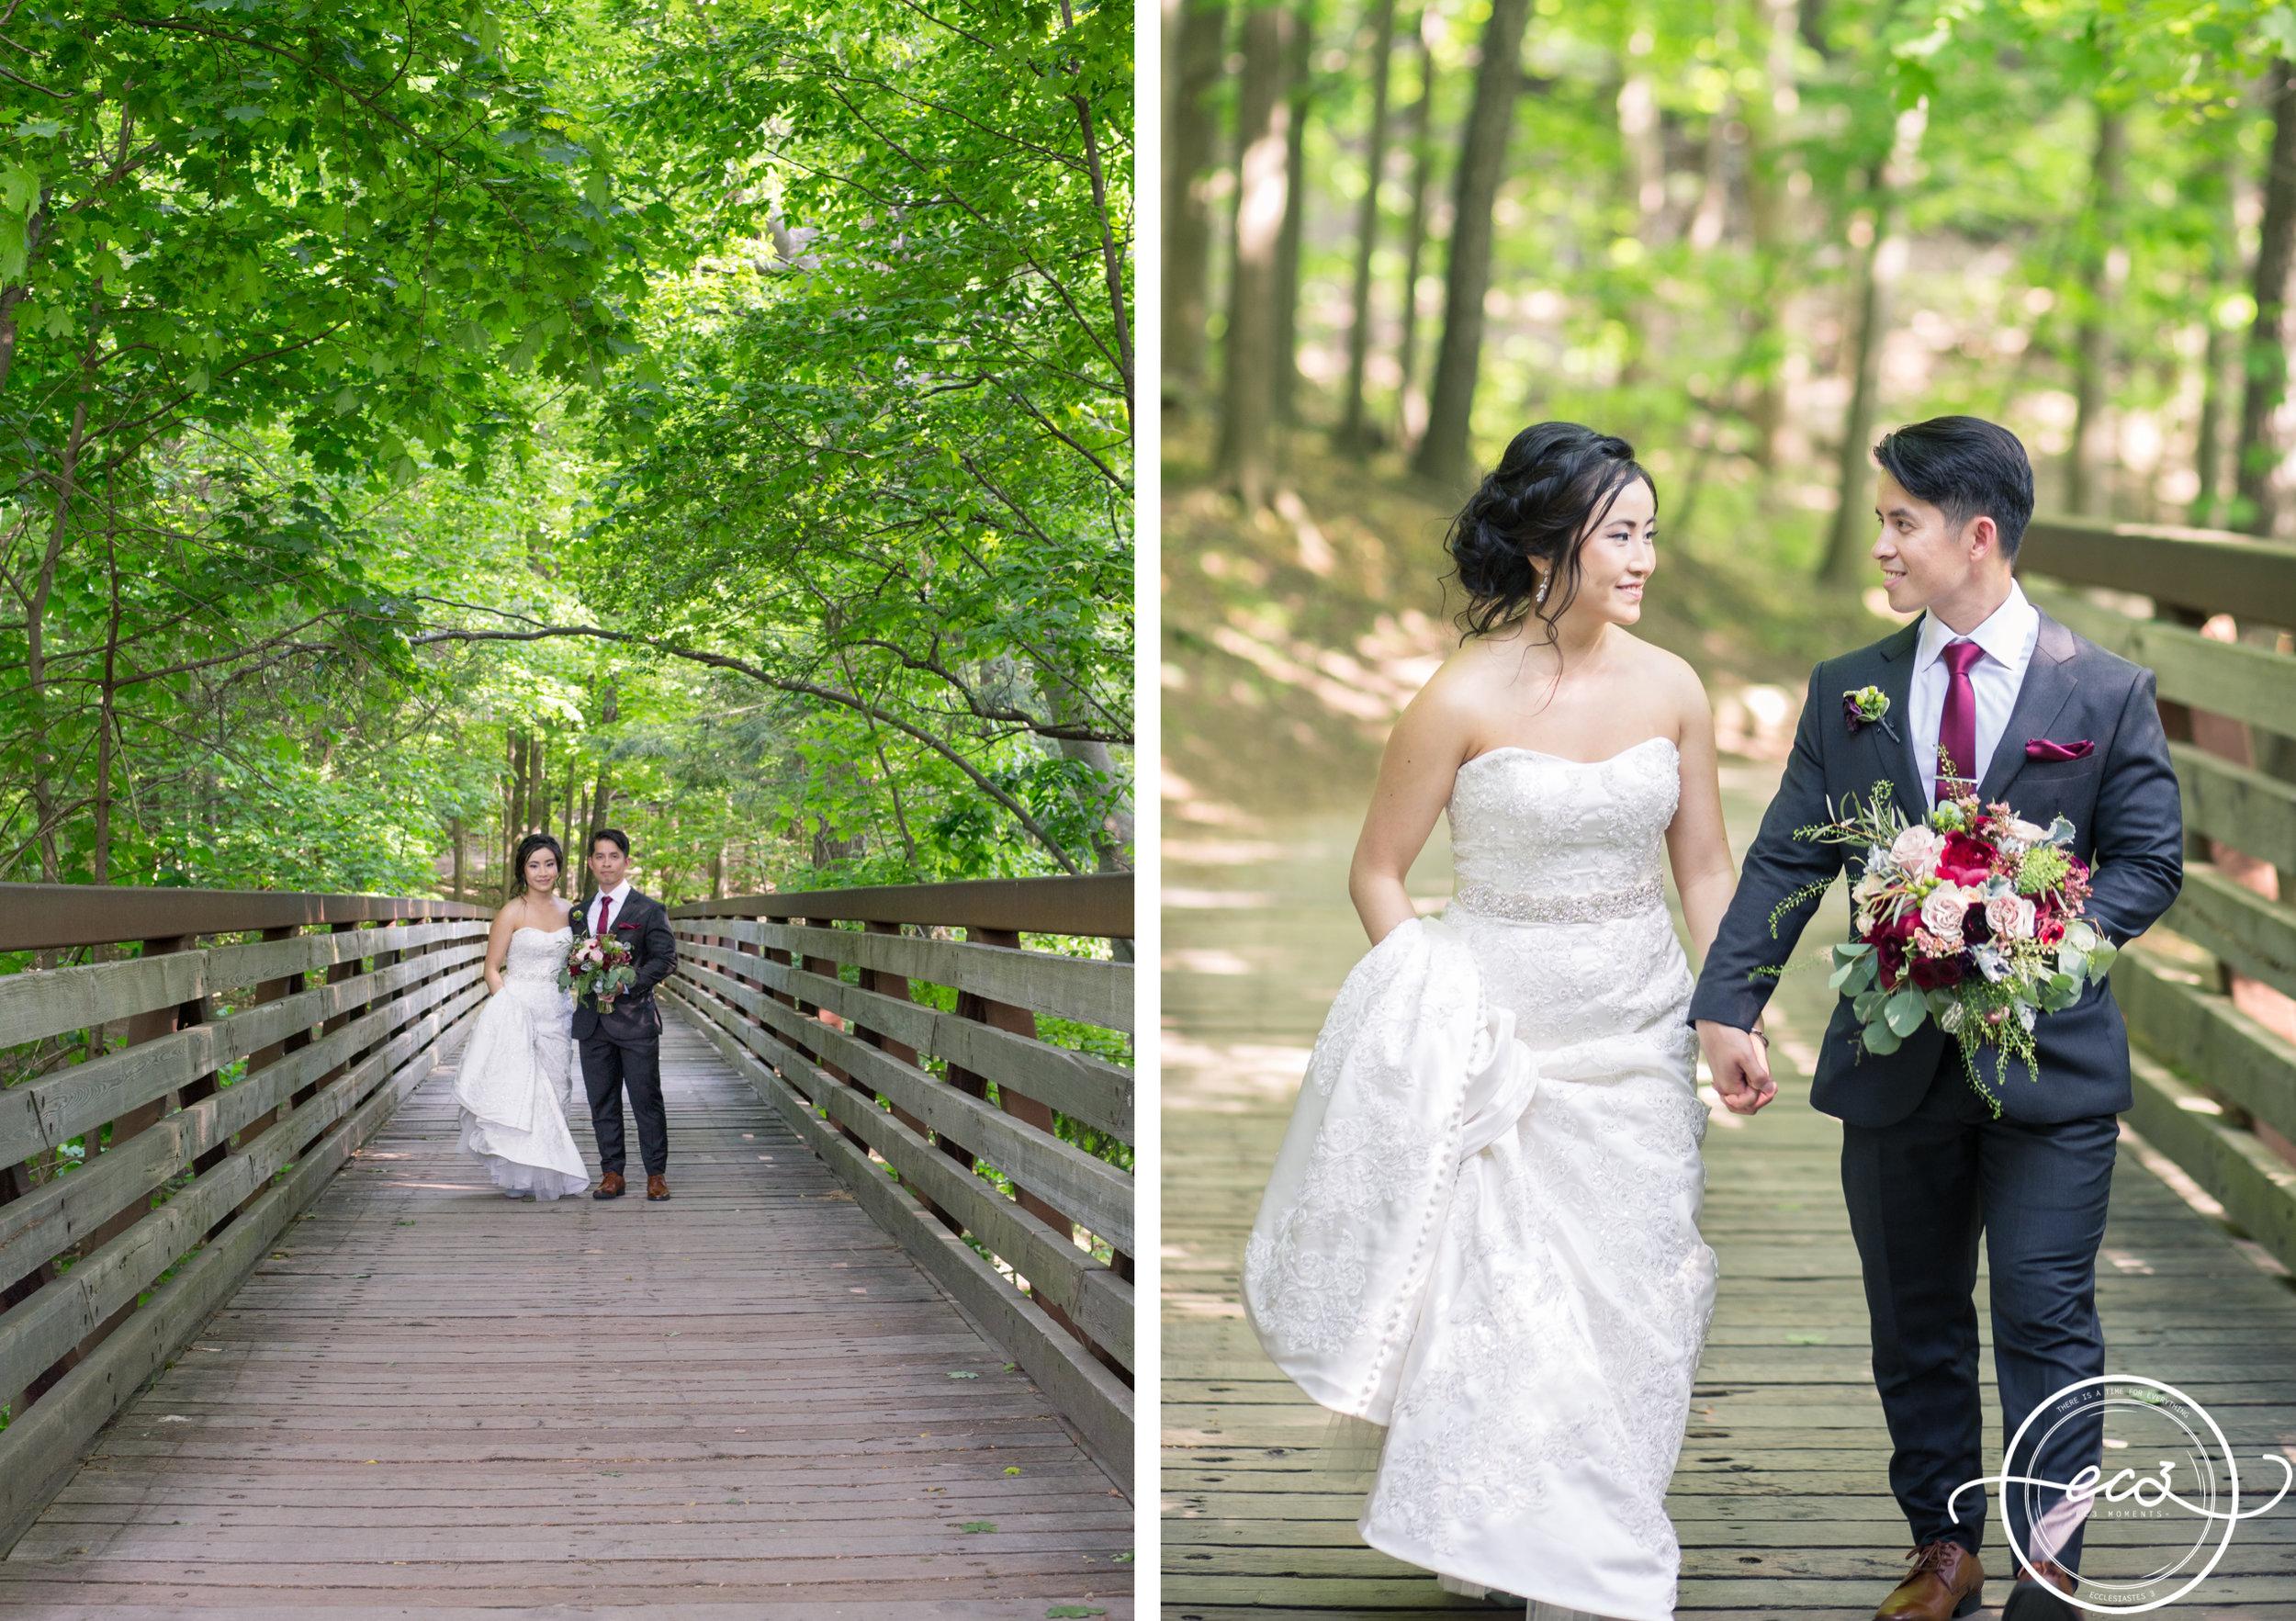 Toronto Edwards Garden and Intimate Vietnamese Wedding26.jpg